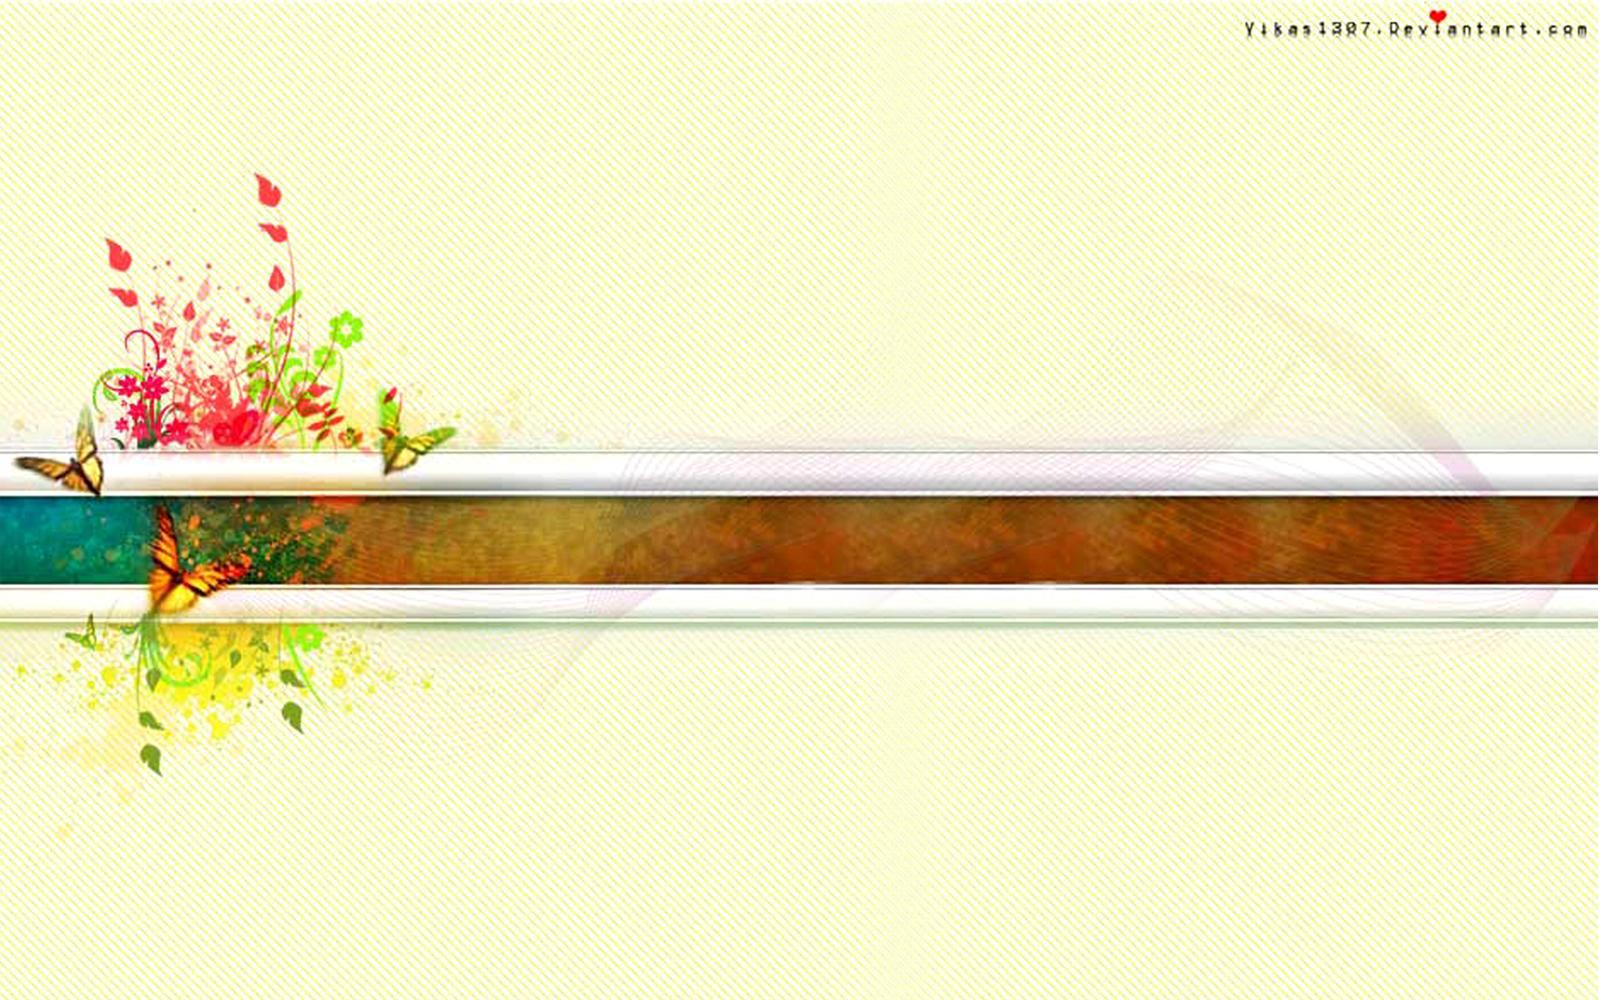 ..:: wallpaper 1 ::... by vikas1307